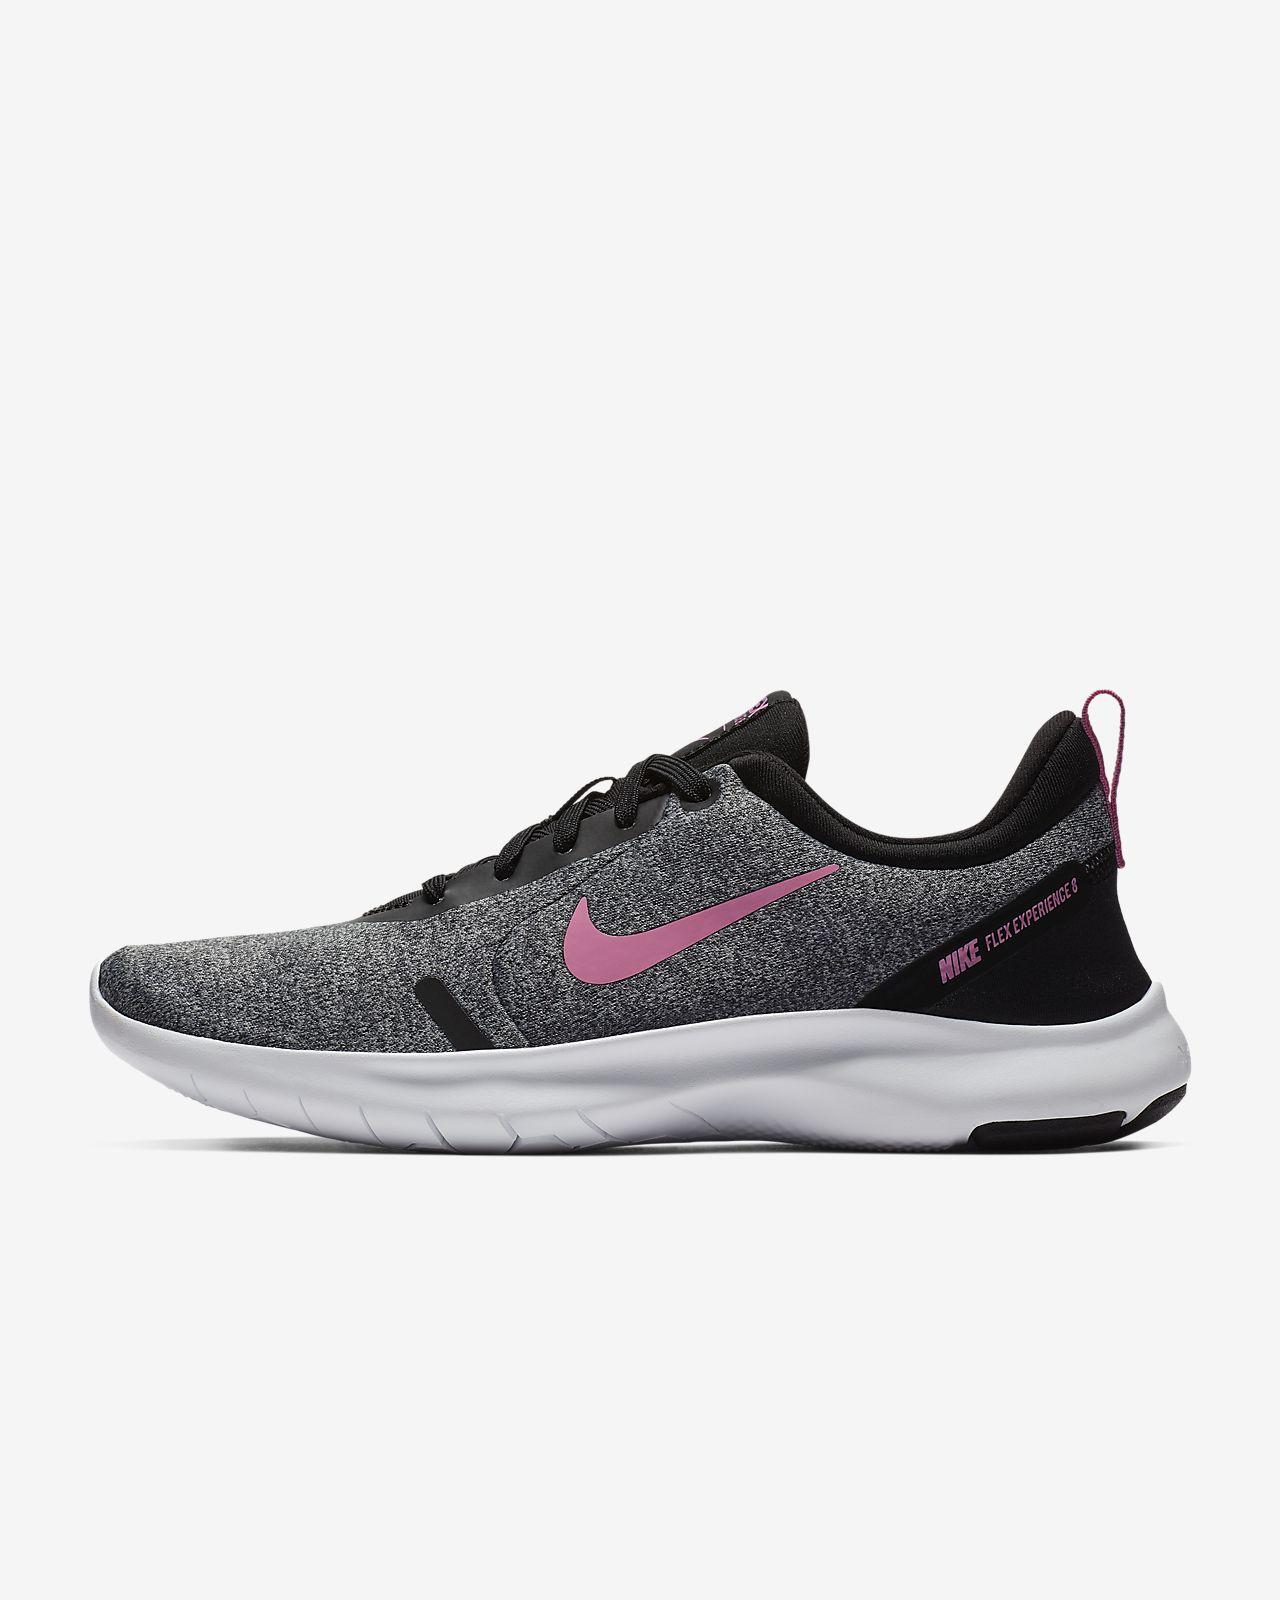 Tenis Nike Flex Experience RN 8 color Negro para Mujer